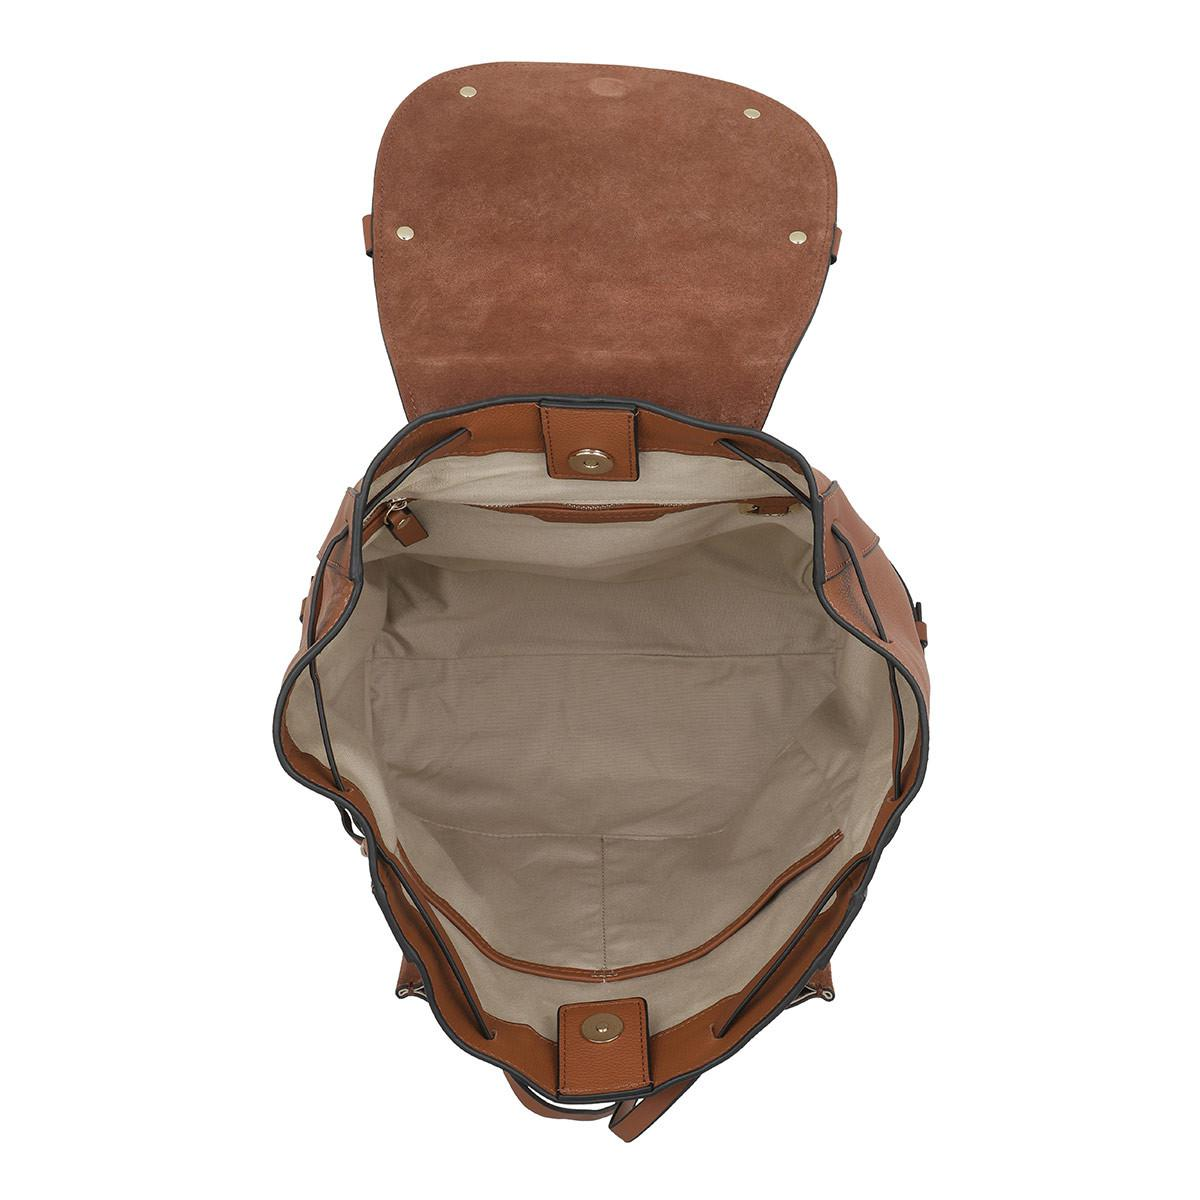 b9ab5c27963 Liebeskind Berlin - Brown New Saddle Backpack Medium Bourbon - Lyst. View  fullscreen